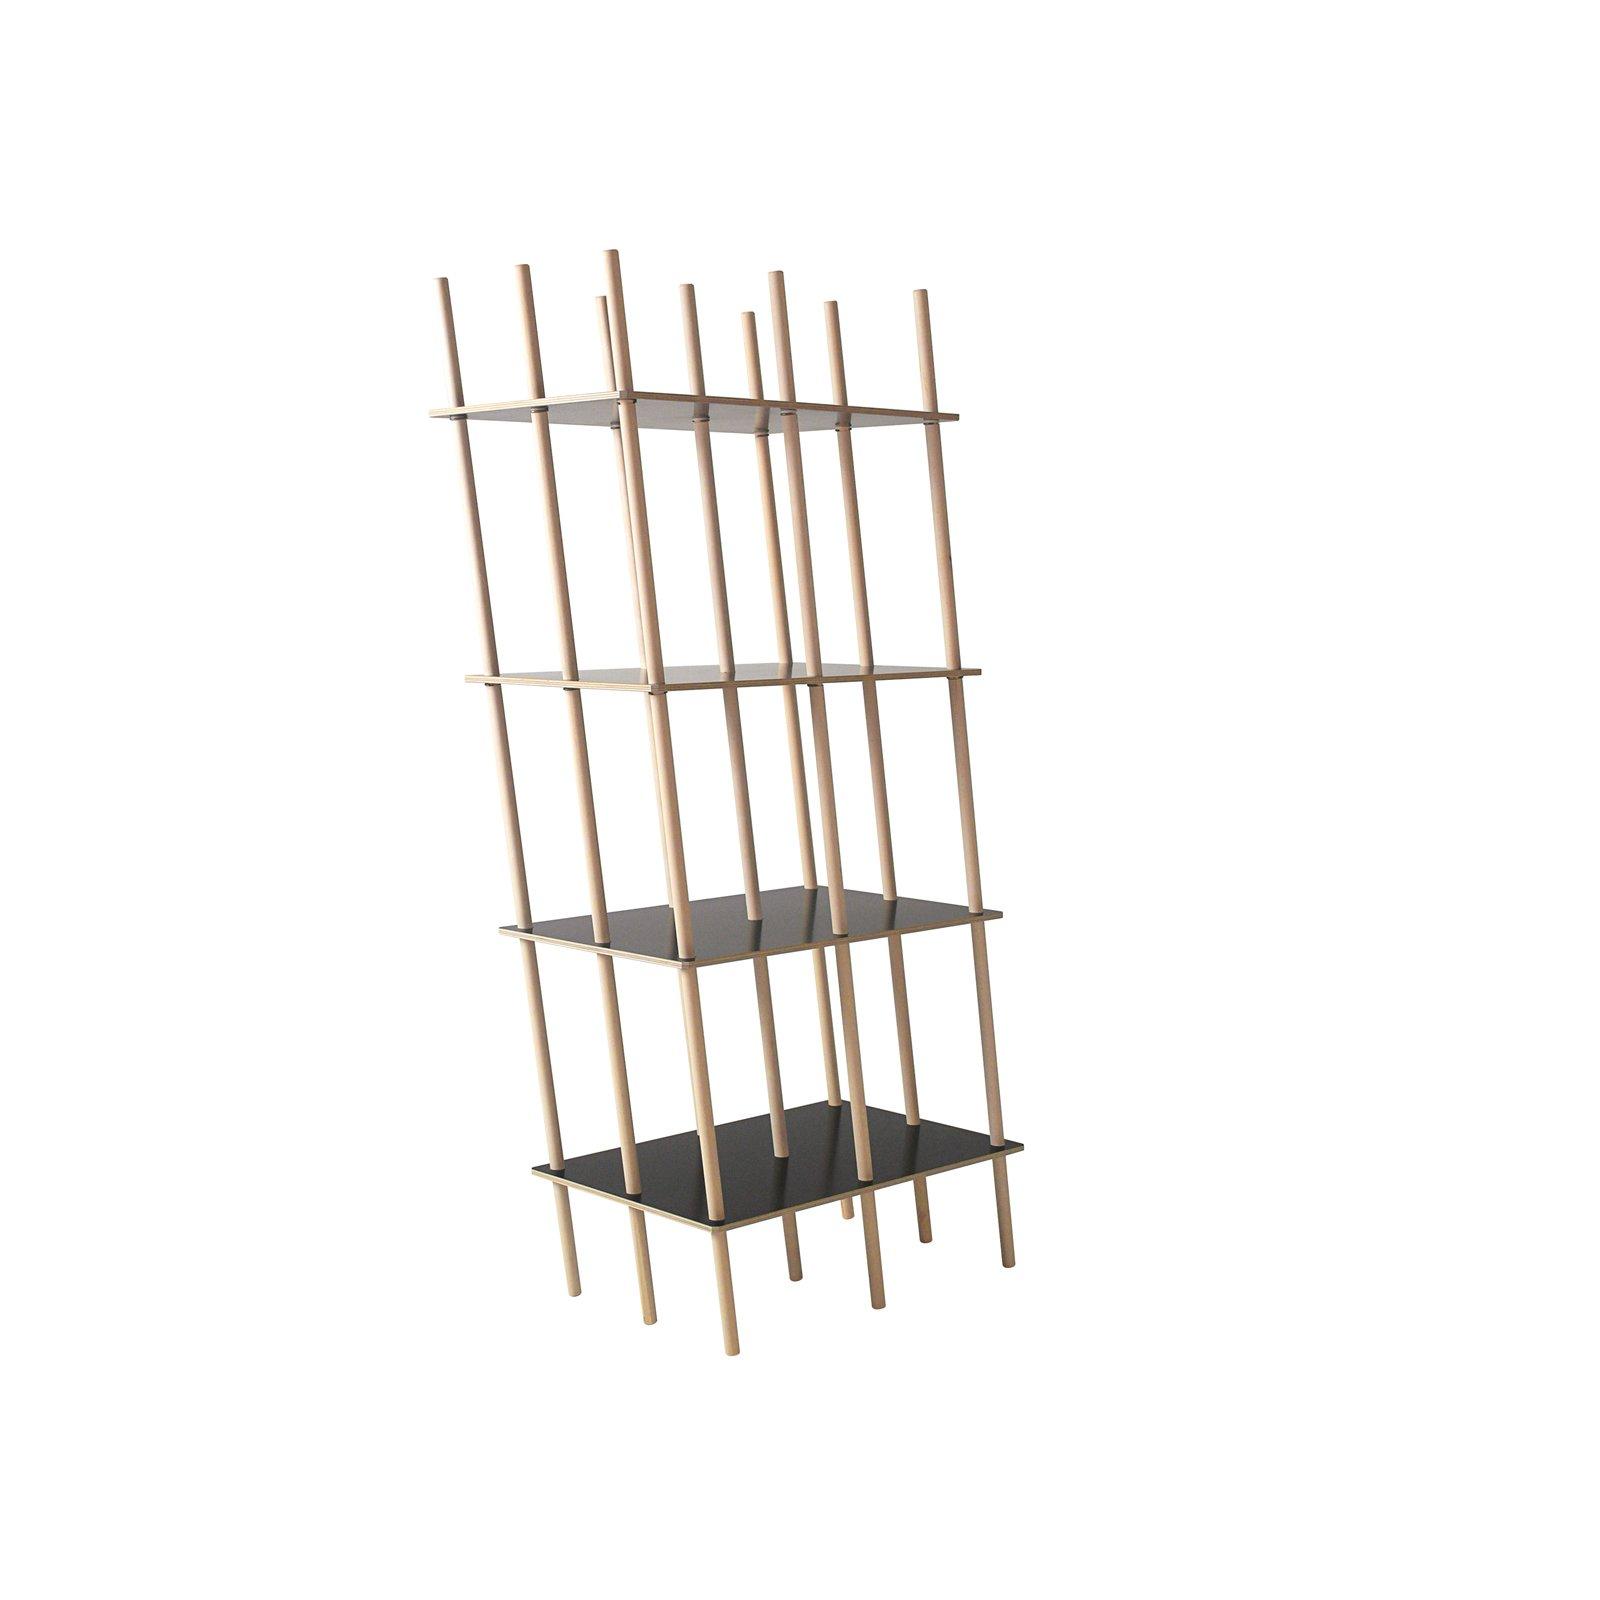 ES Shelf for Moormann, 1999. Industrial Designer Focus: Konstantin Grcic - Photo 19 of 26